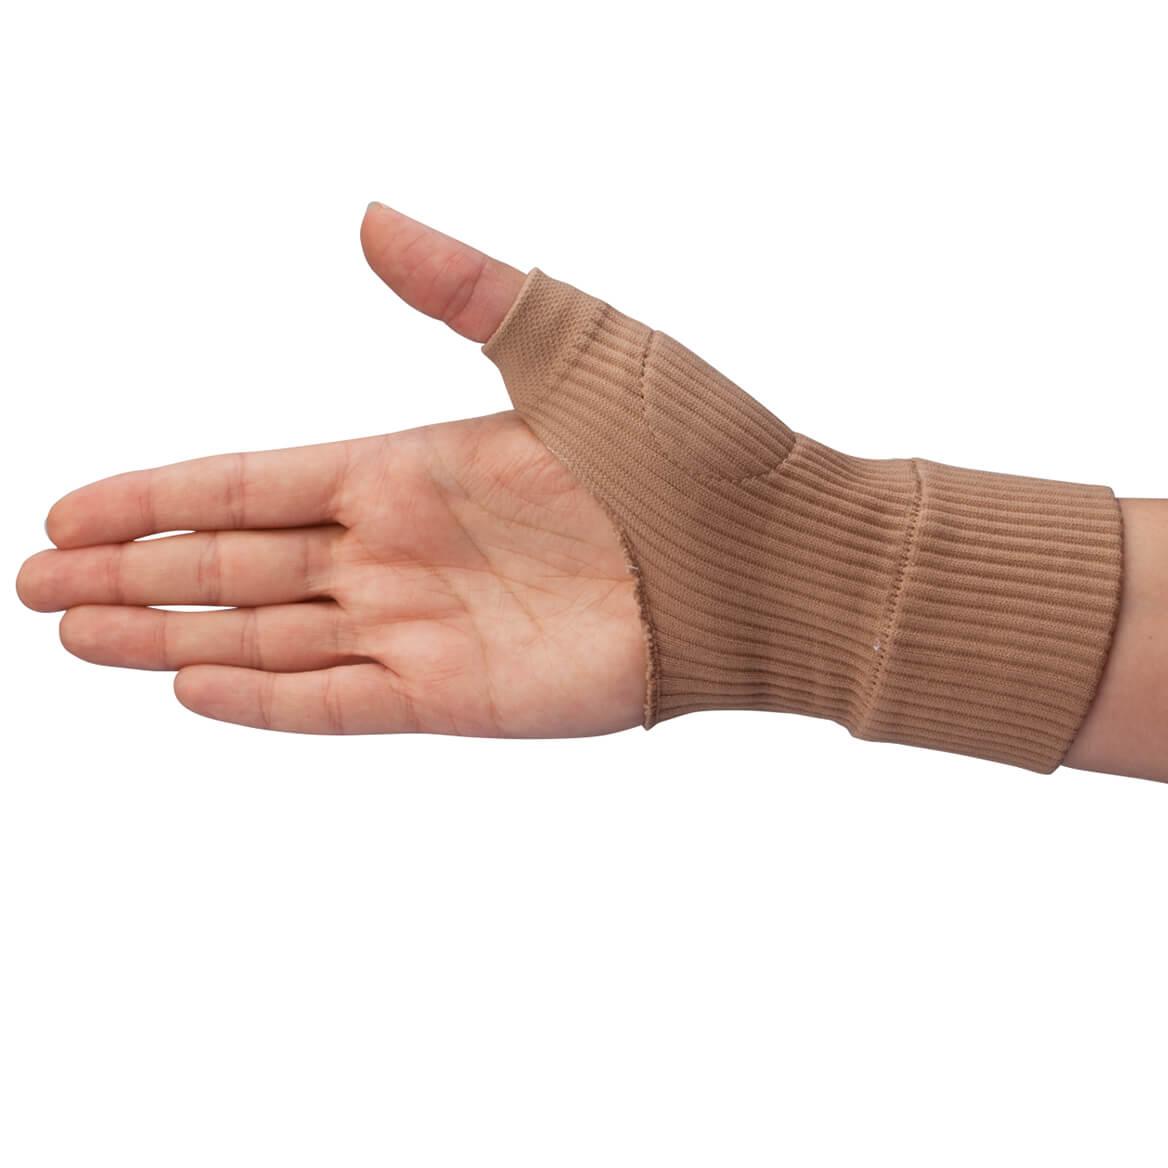 Gel Thumb Support - Thumb Brace - Thumb Stabilizer - Miles Kimball